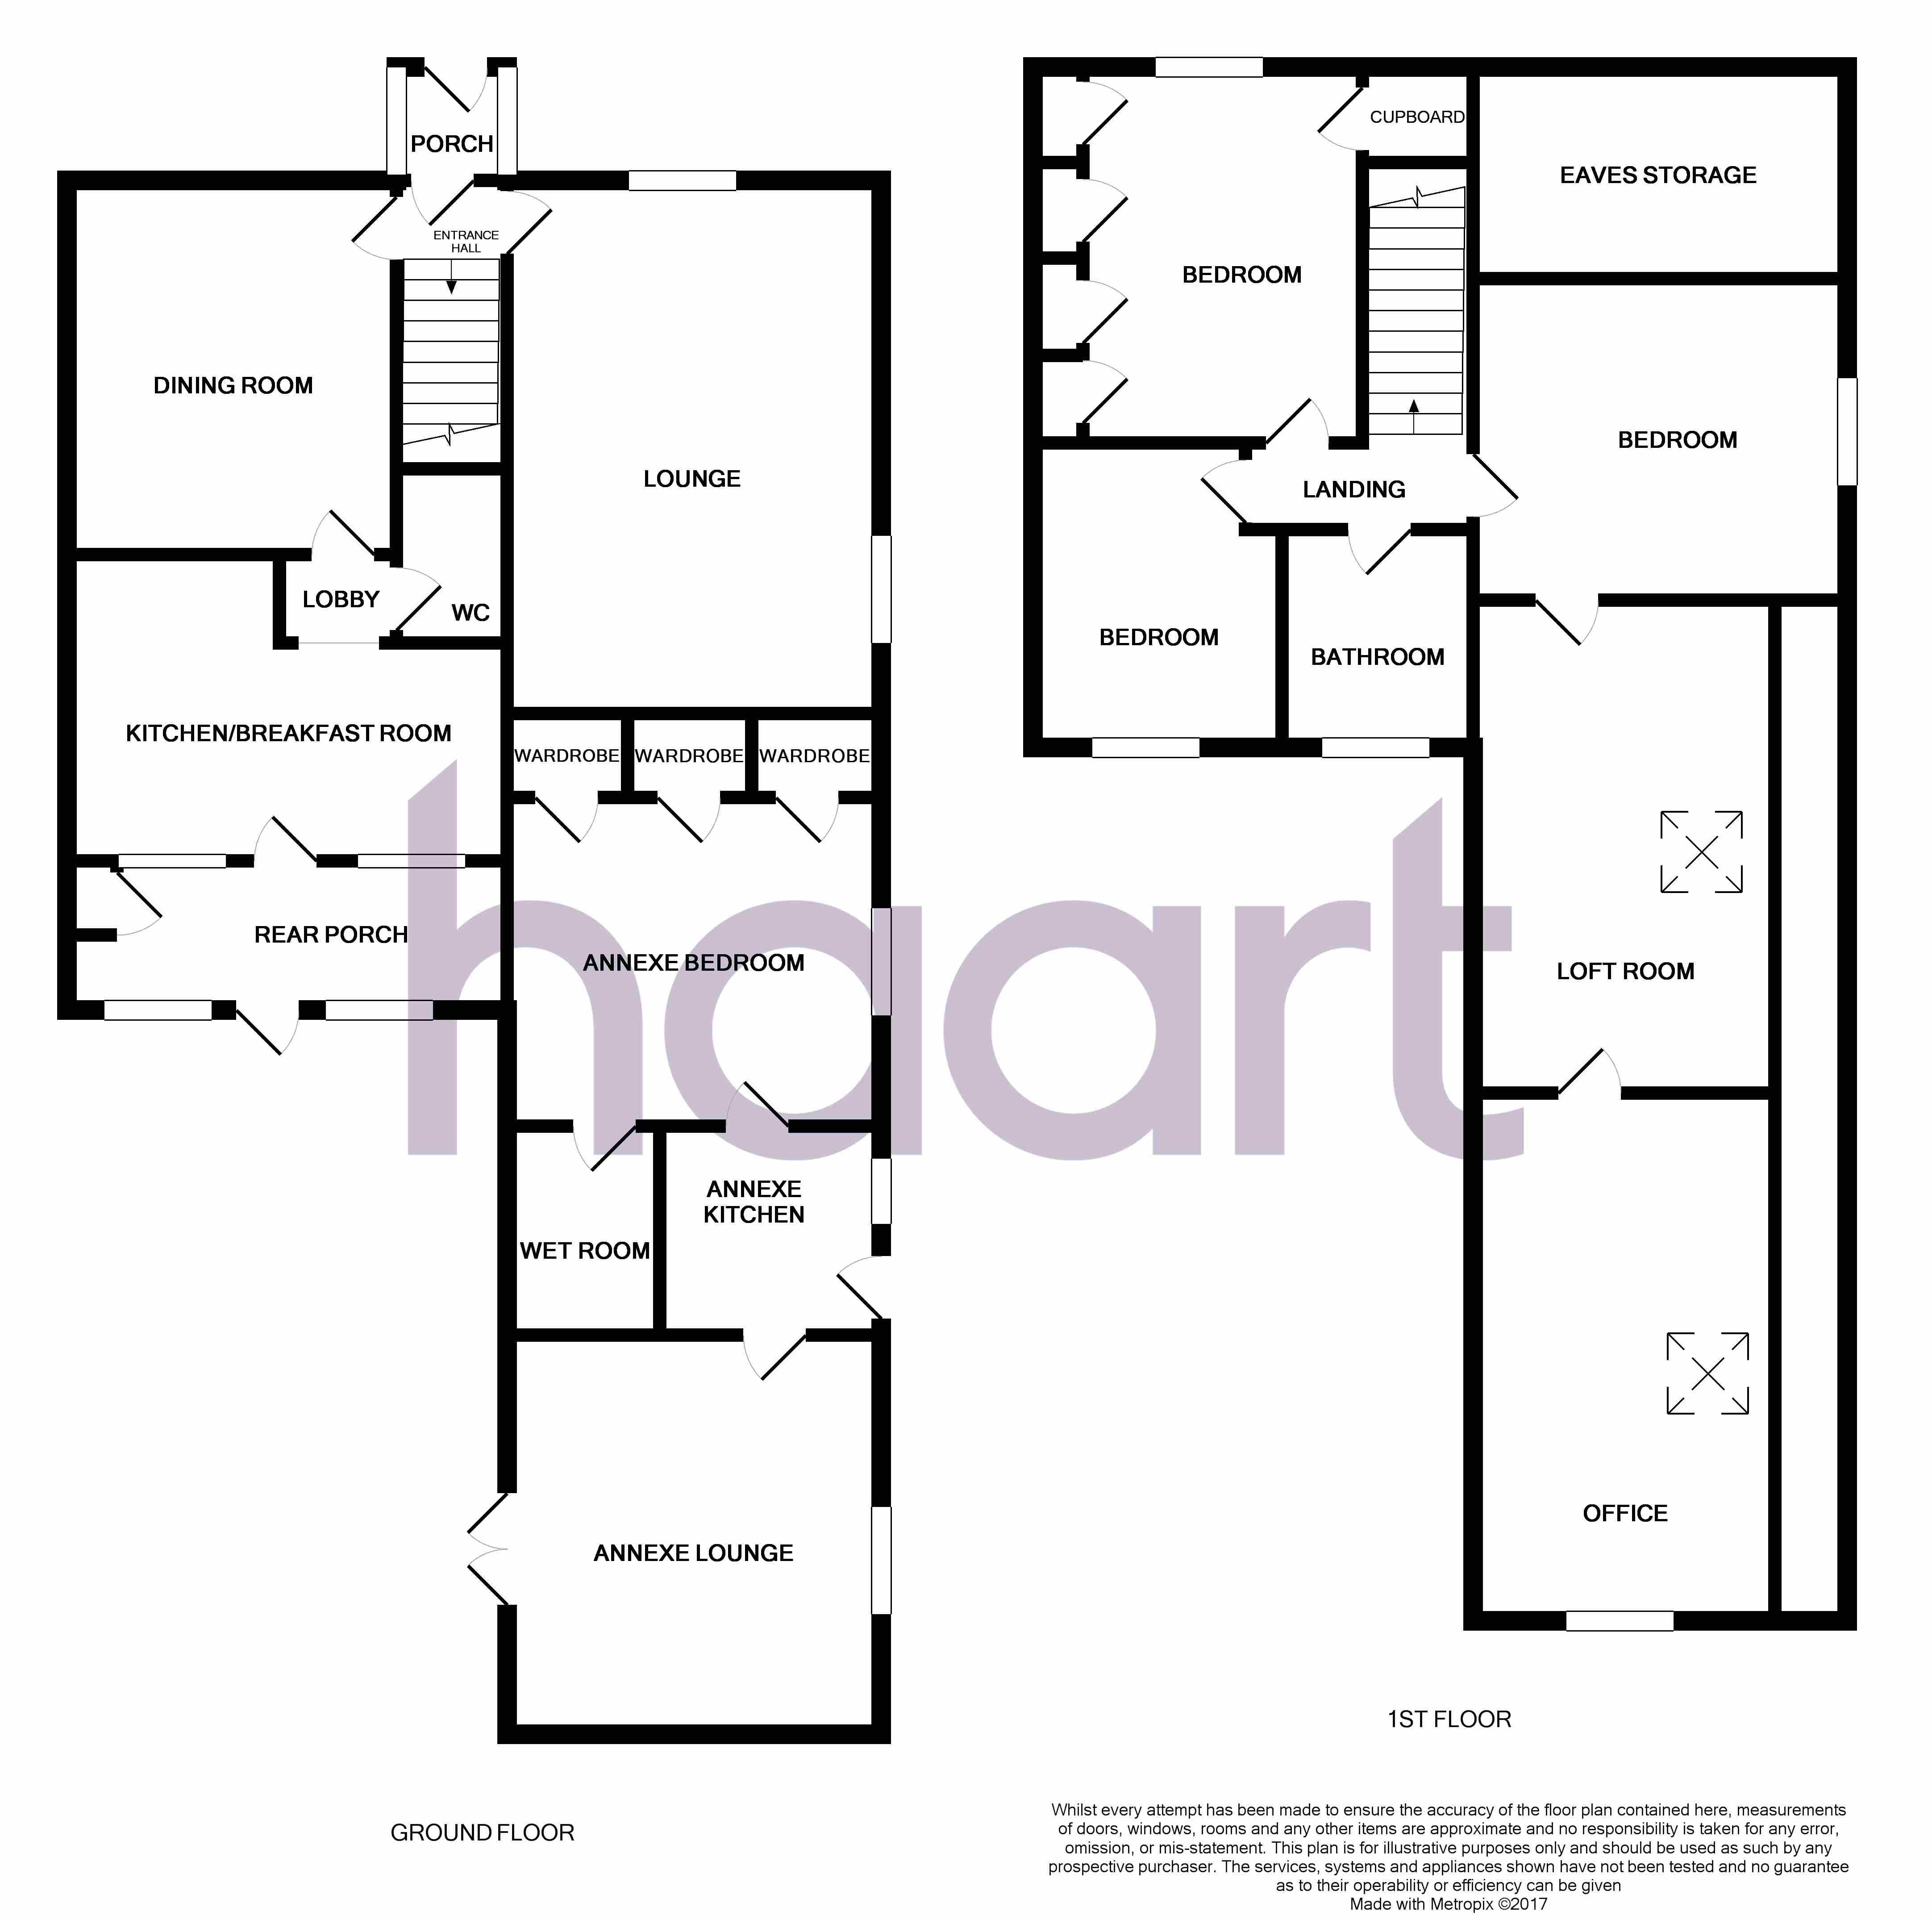 5 bedroom semi detached house floor plans house interior for Semi detached house floor plan